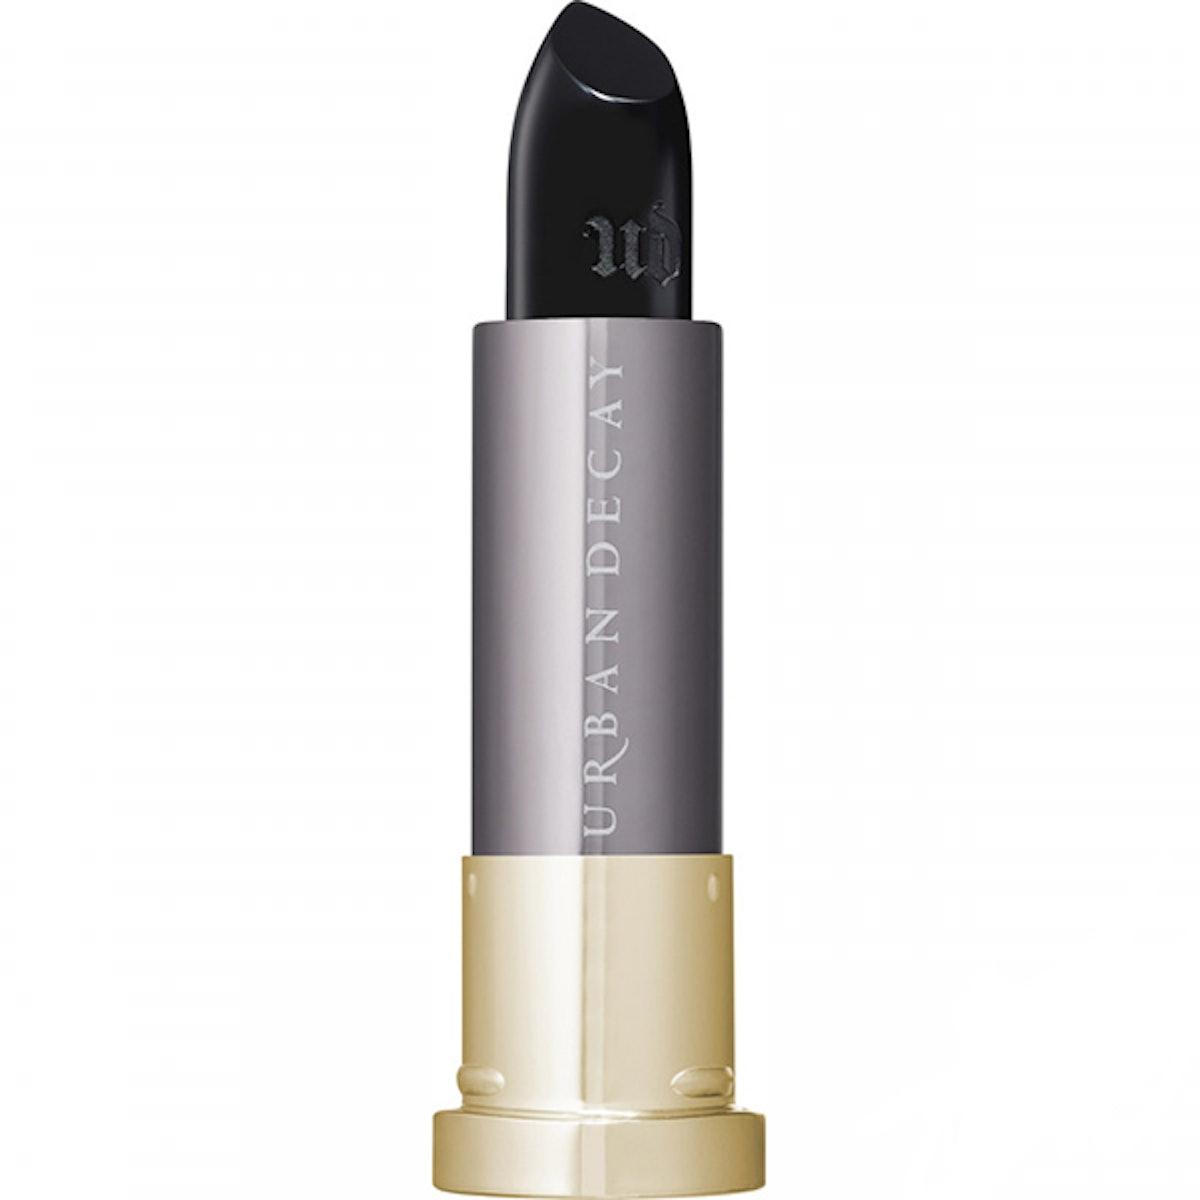 Vice Lipstick Comfort Matte in Perversion